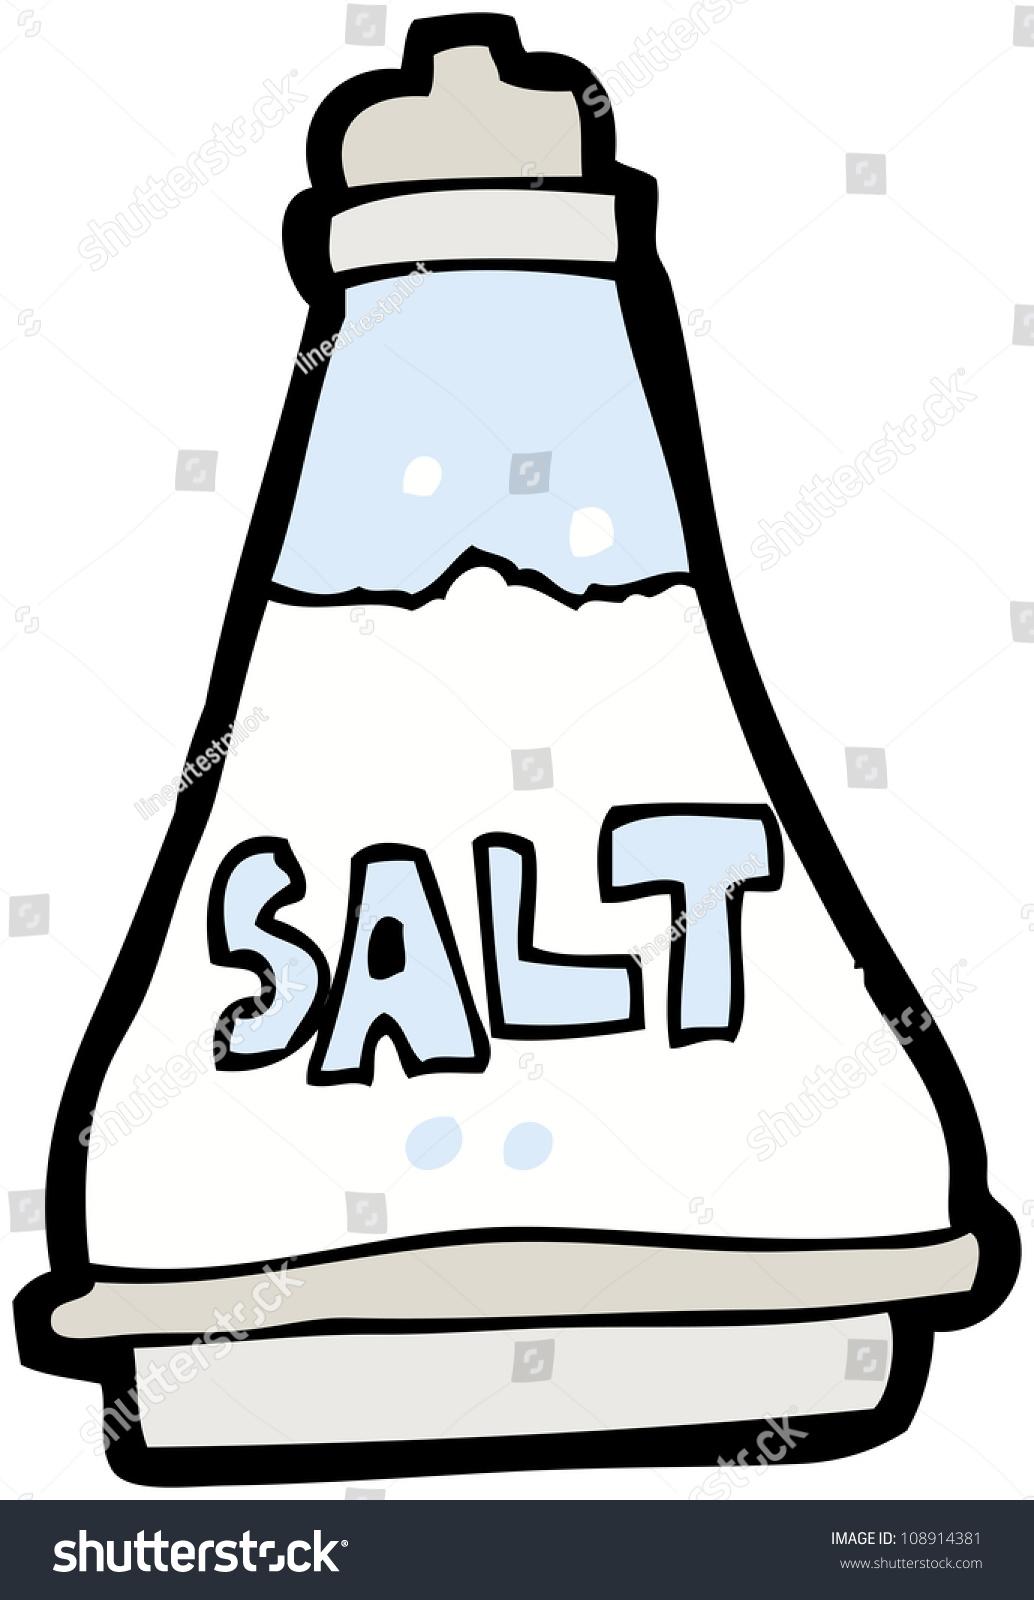 Crazy Salt Cartoon Stock Illustration - Image: 48898100